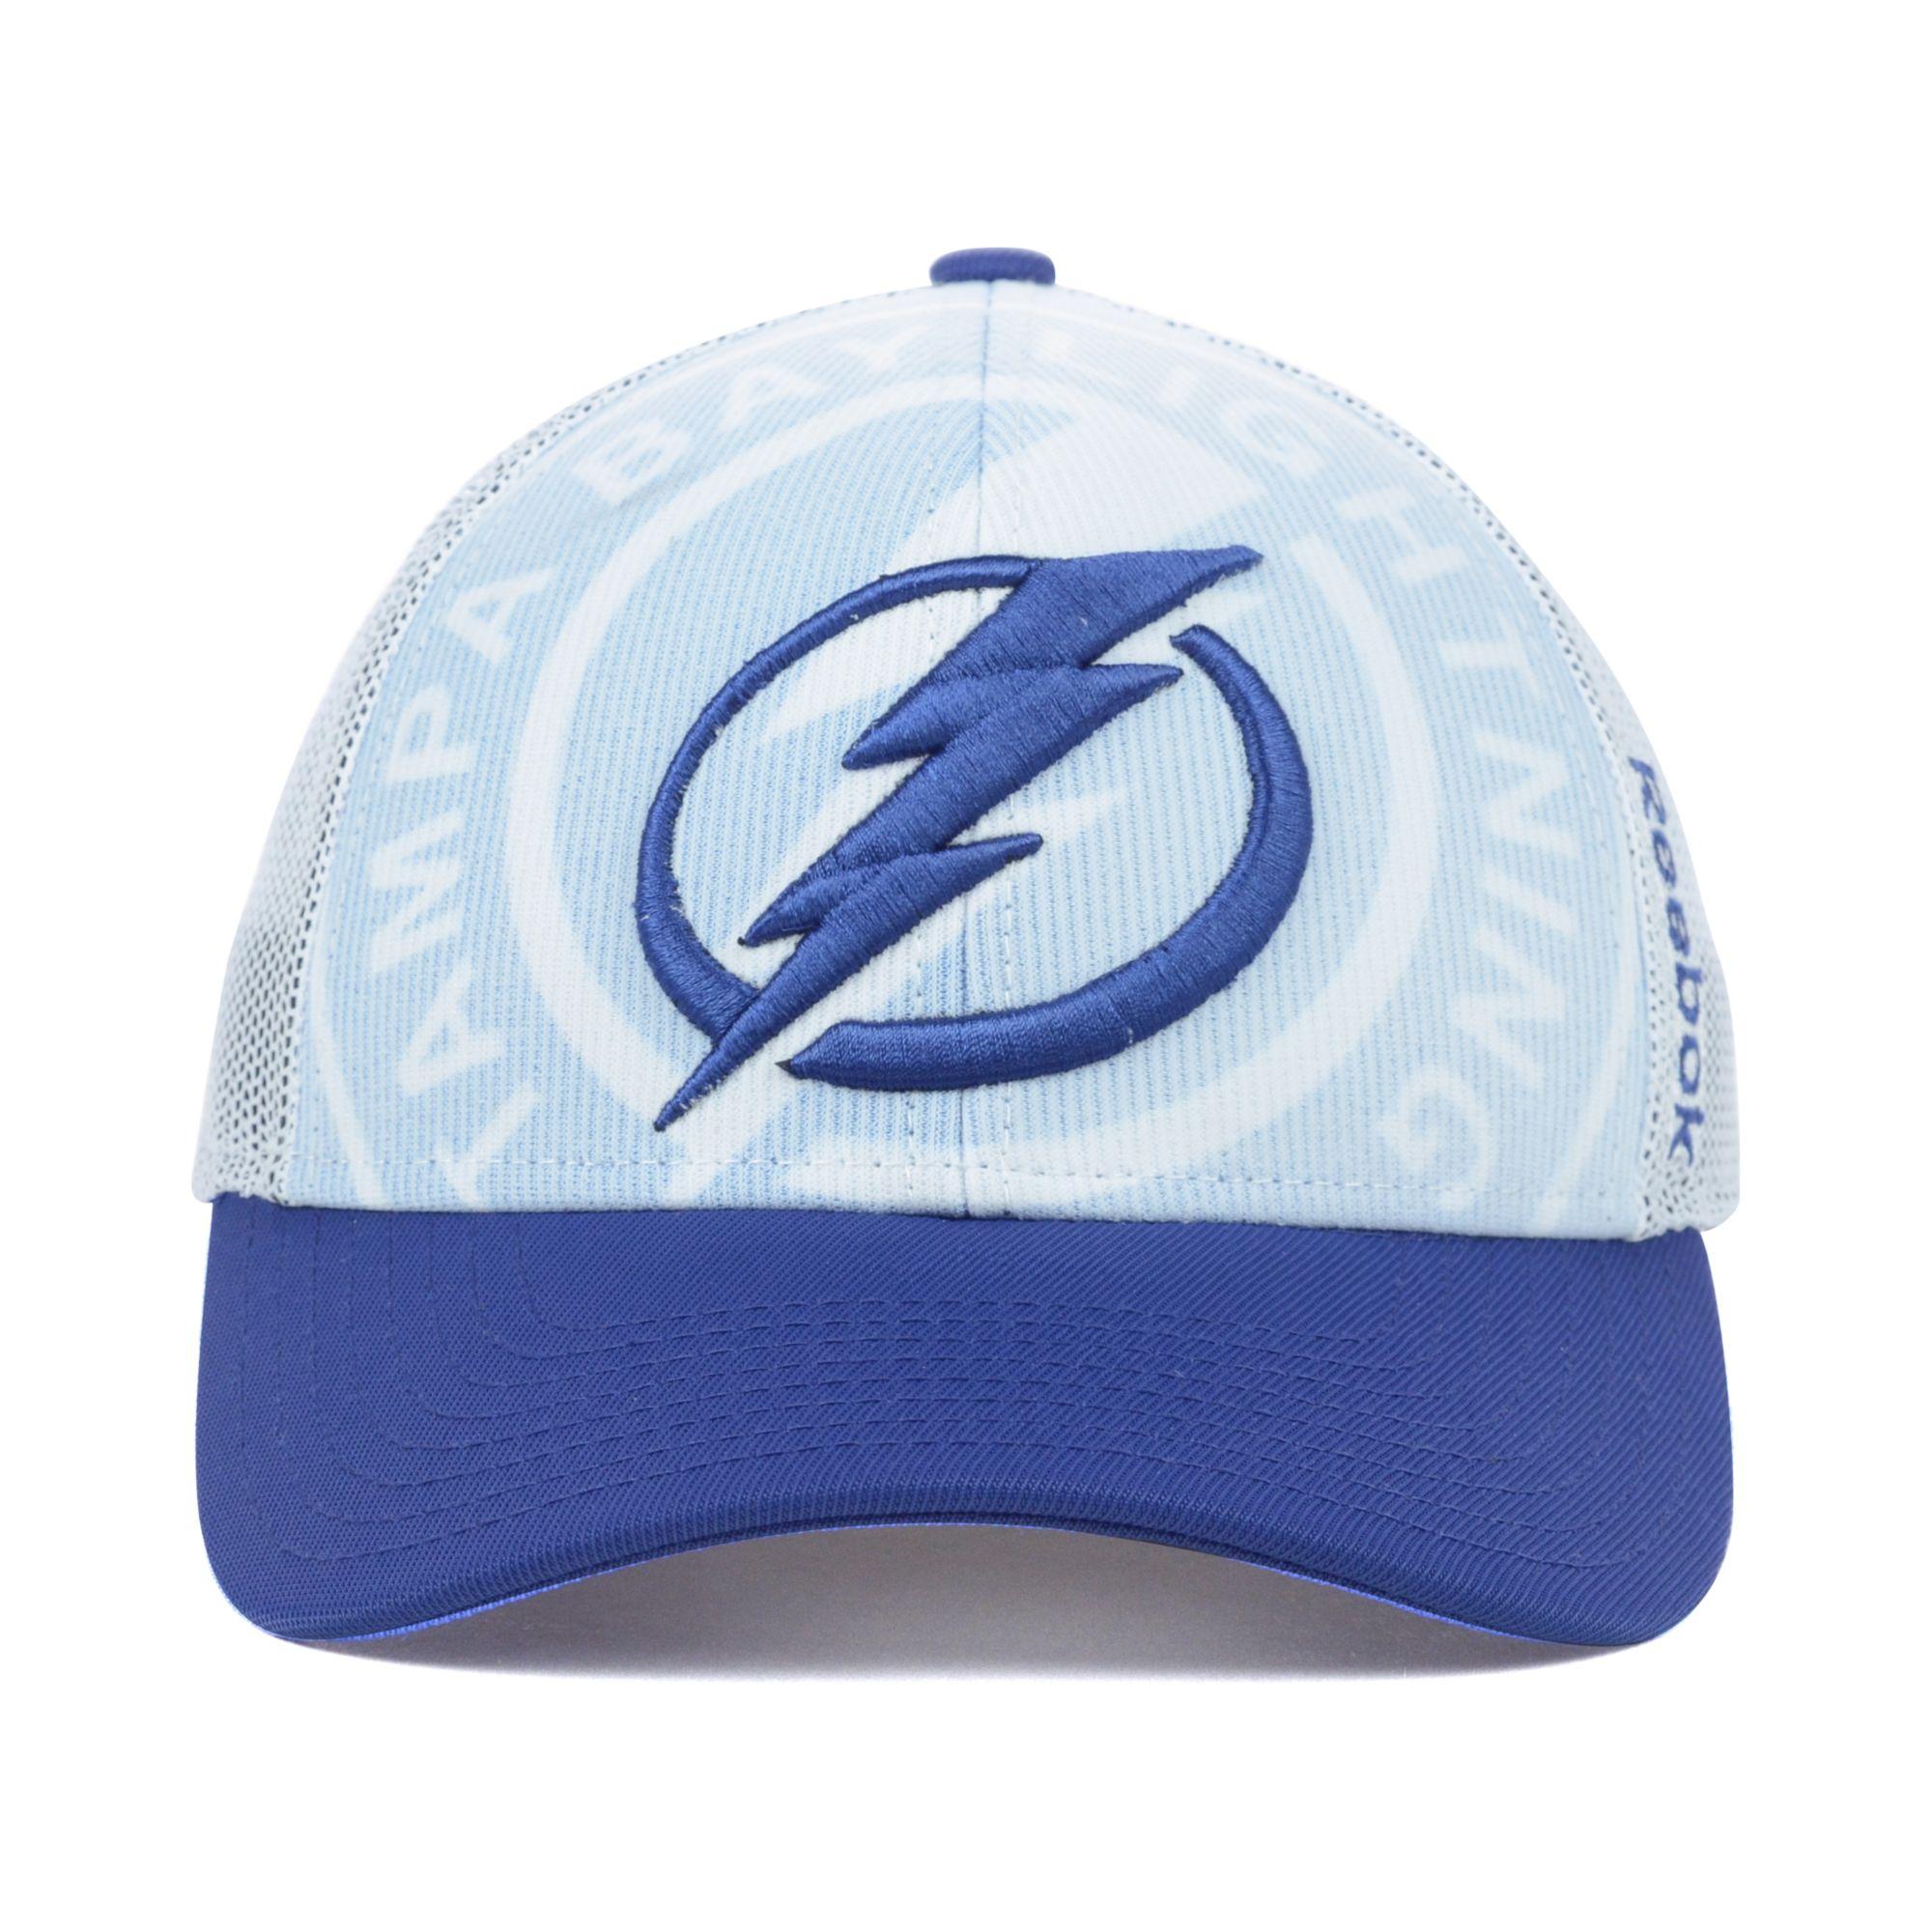 fe70fd7d ... where to buy lyst reebok tampa bay lightning nhl draft cap in blue for  men 5249d